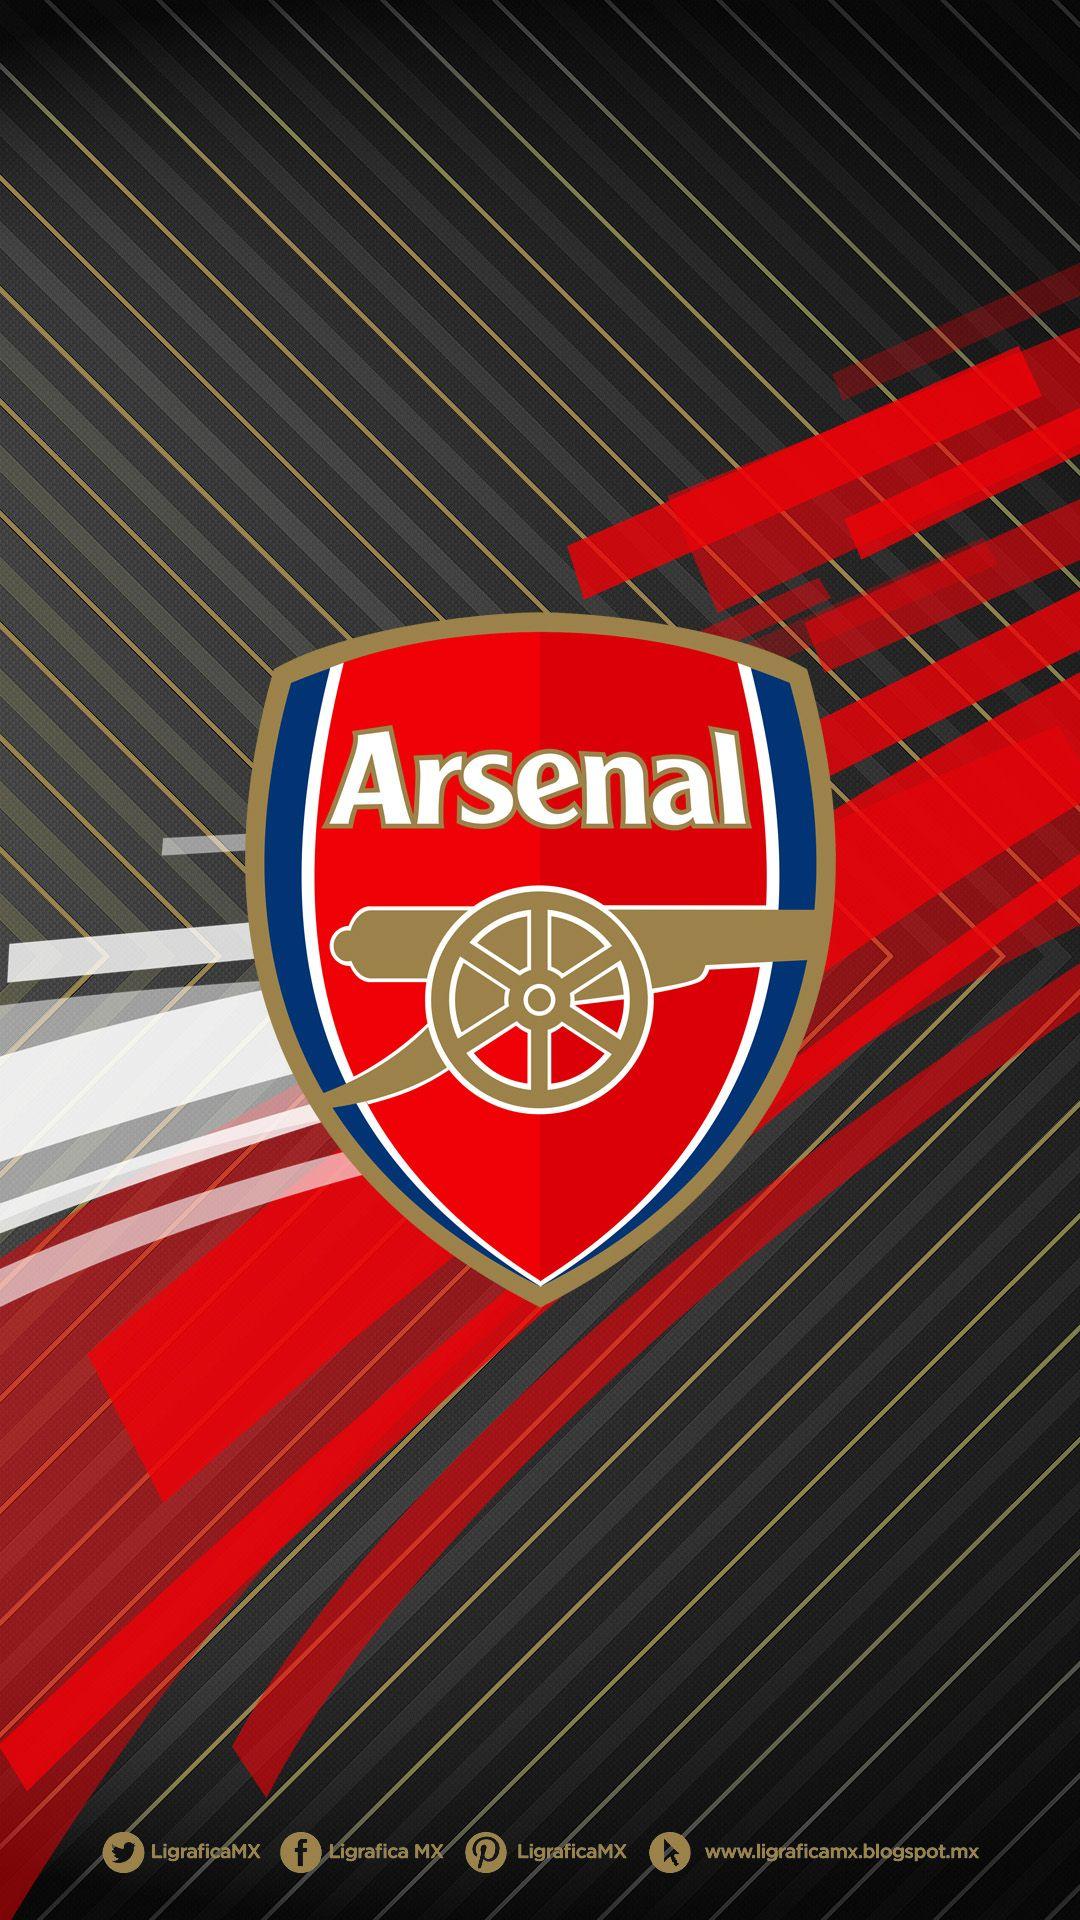 Arsenal Ligraficamx 160214ctg 1 Futbolnyj Klub Arsenal Arsenal Futbol Arsenal